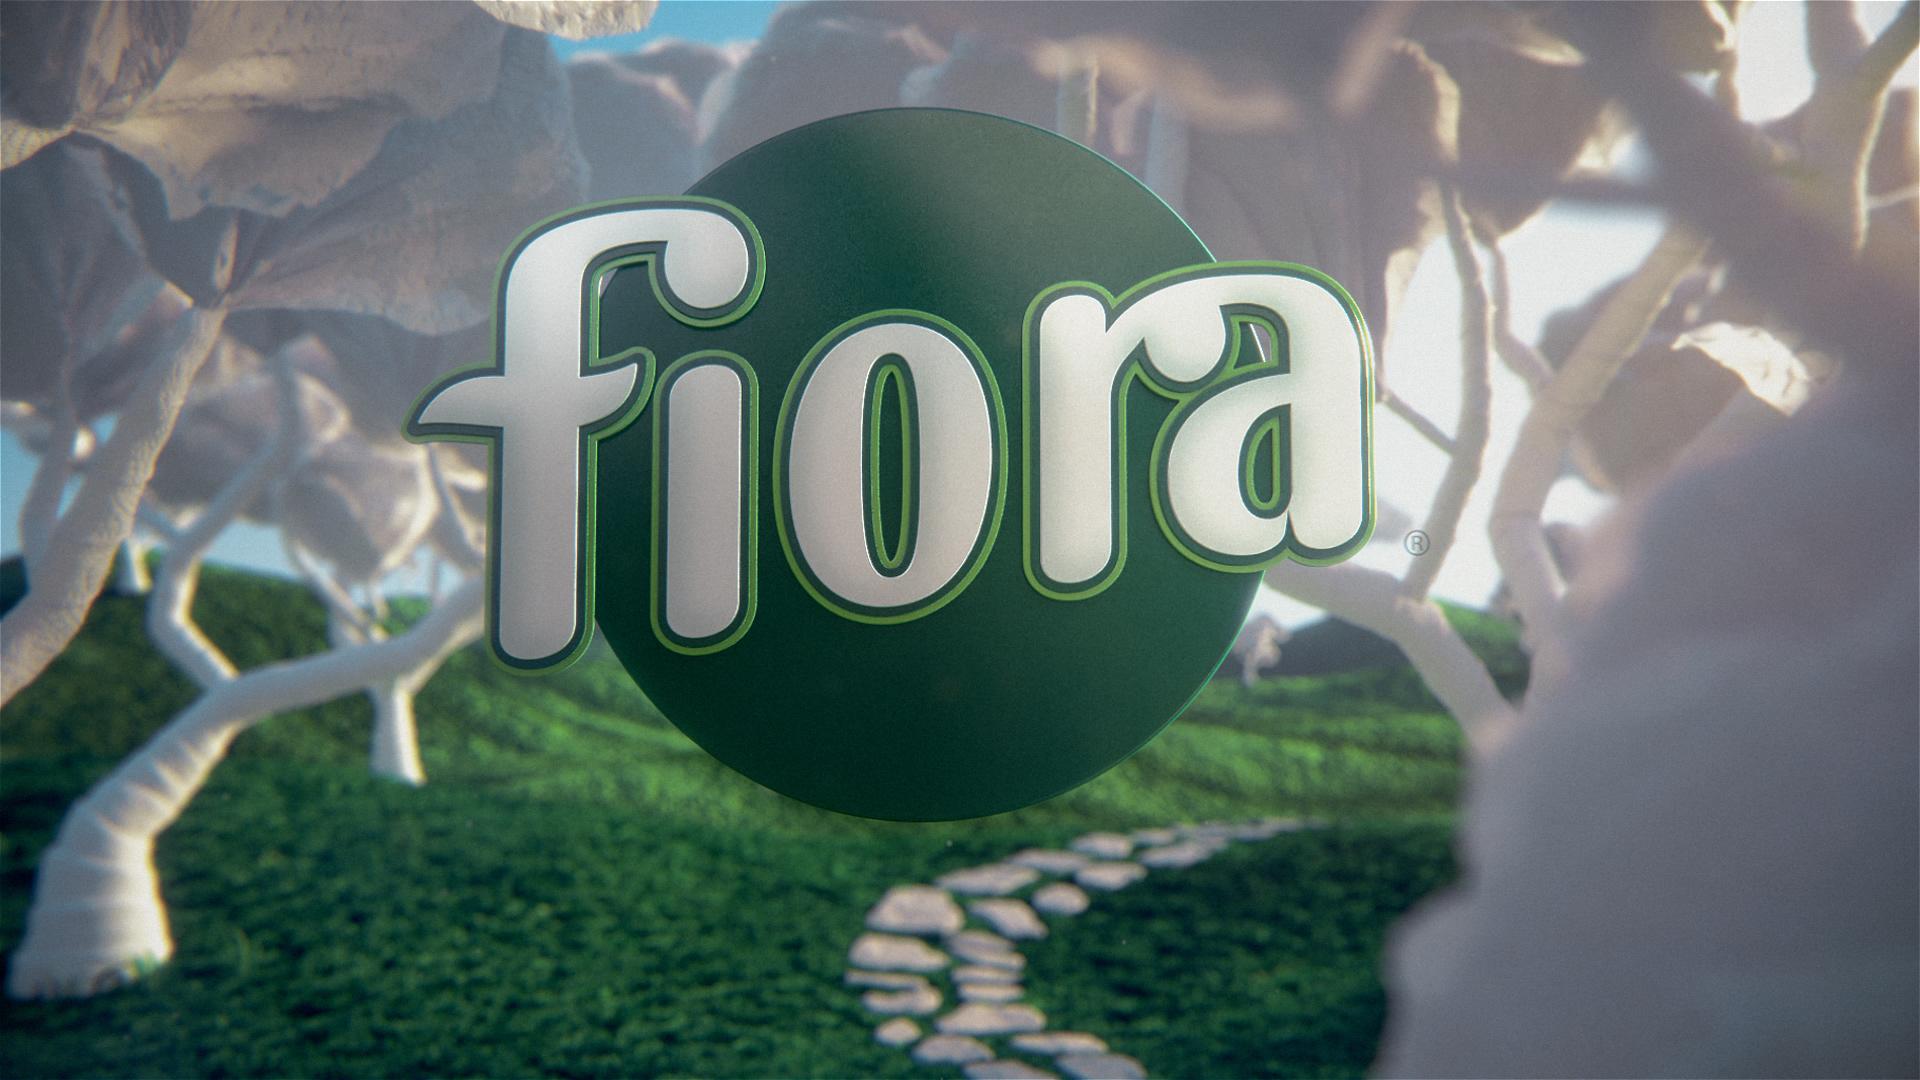 FIORA - CC (0-00-00-01).jpg